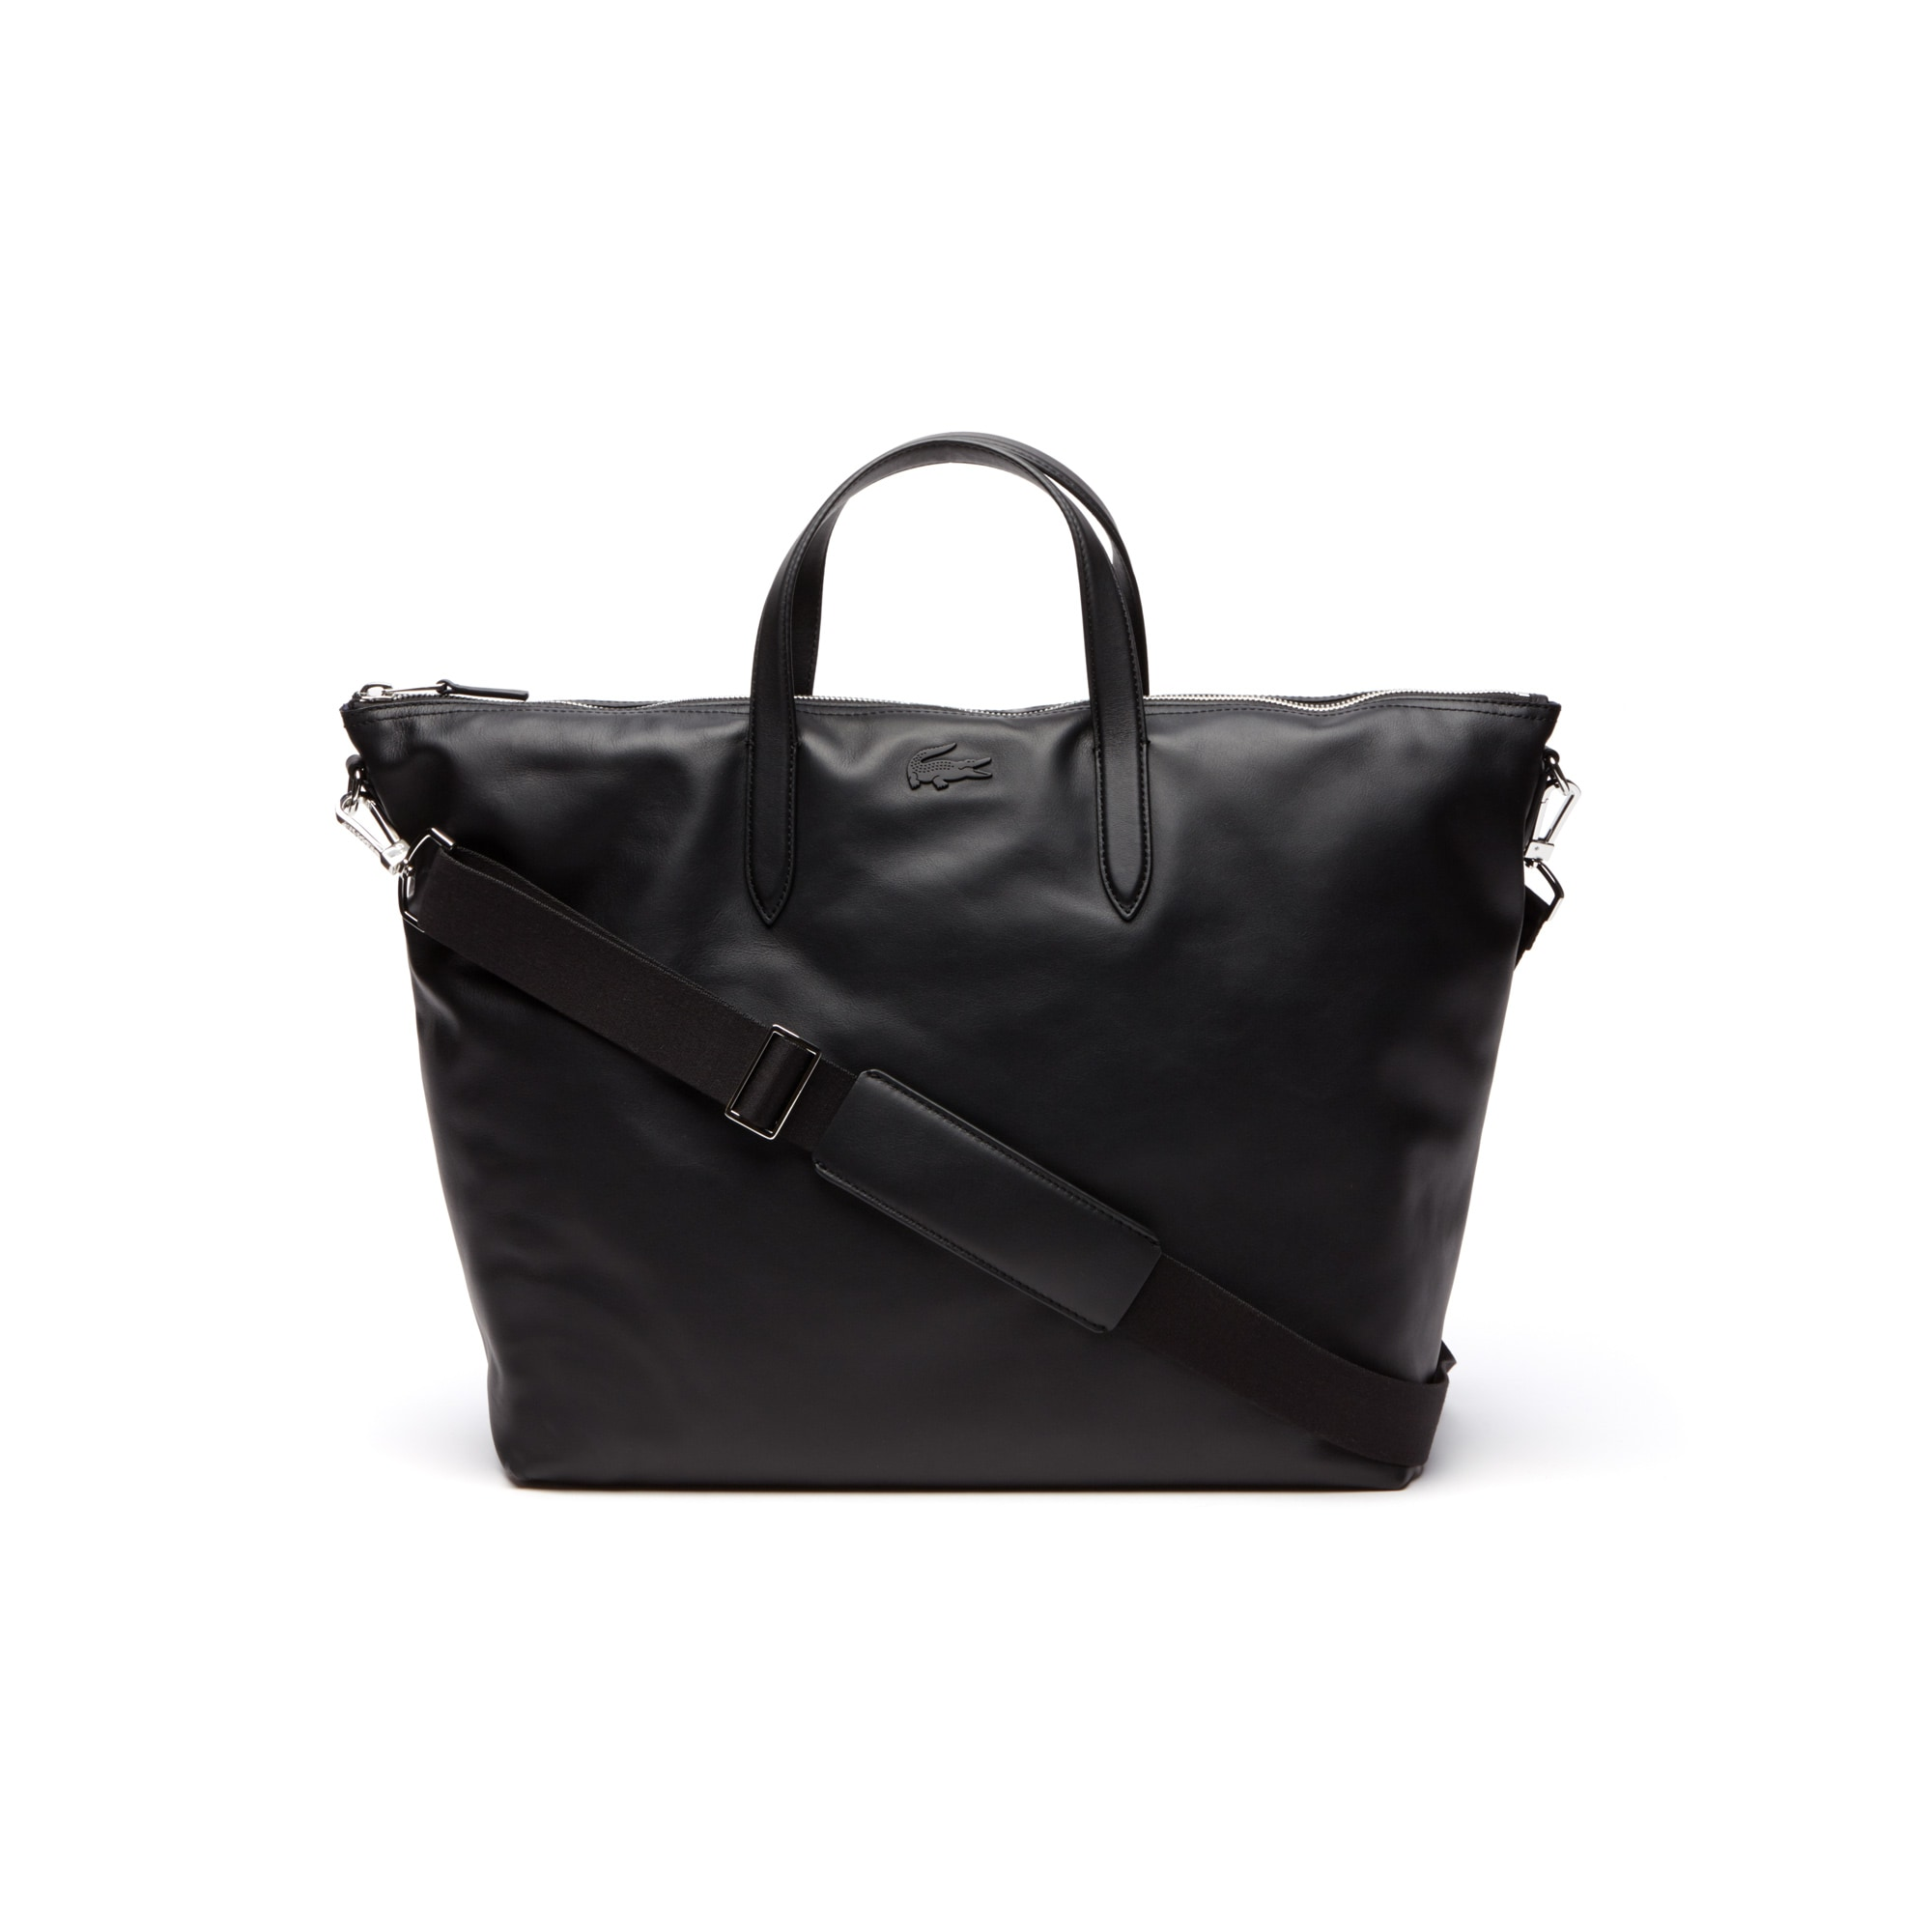 Grand sac cabas zippé L.12.12 cuir Business